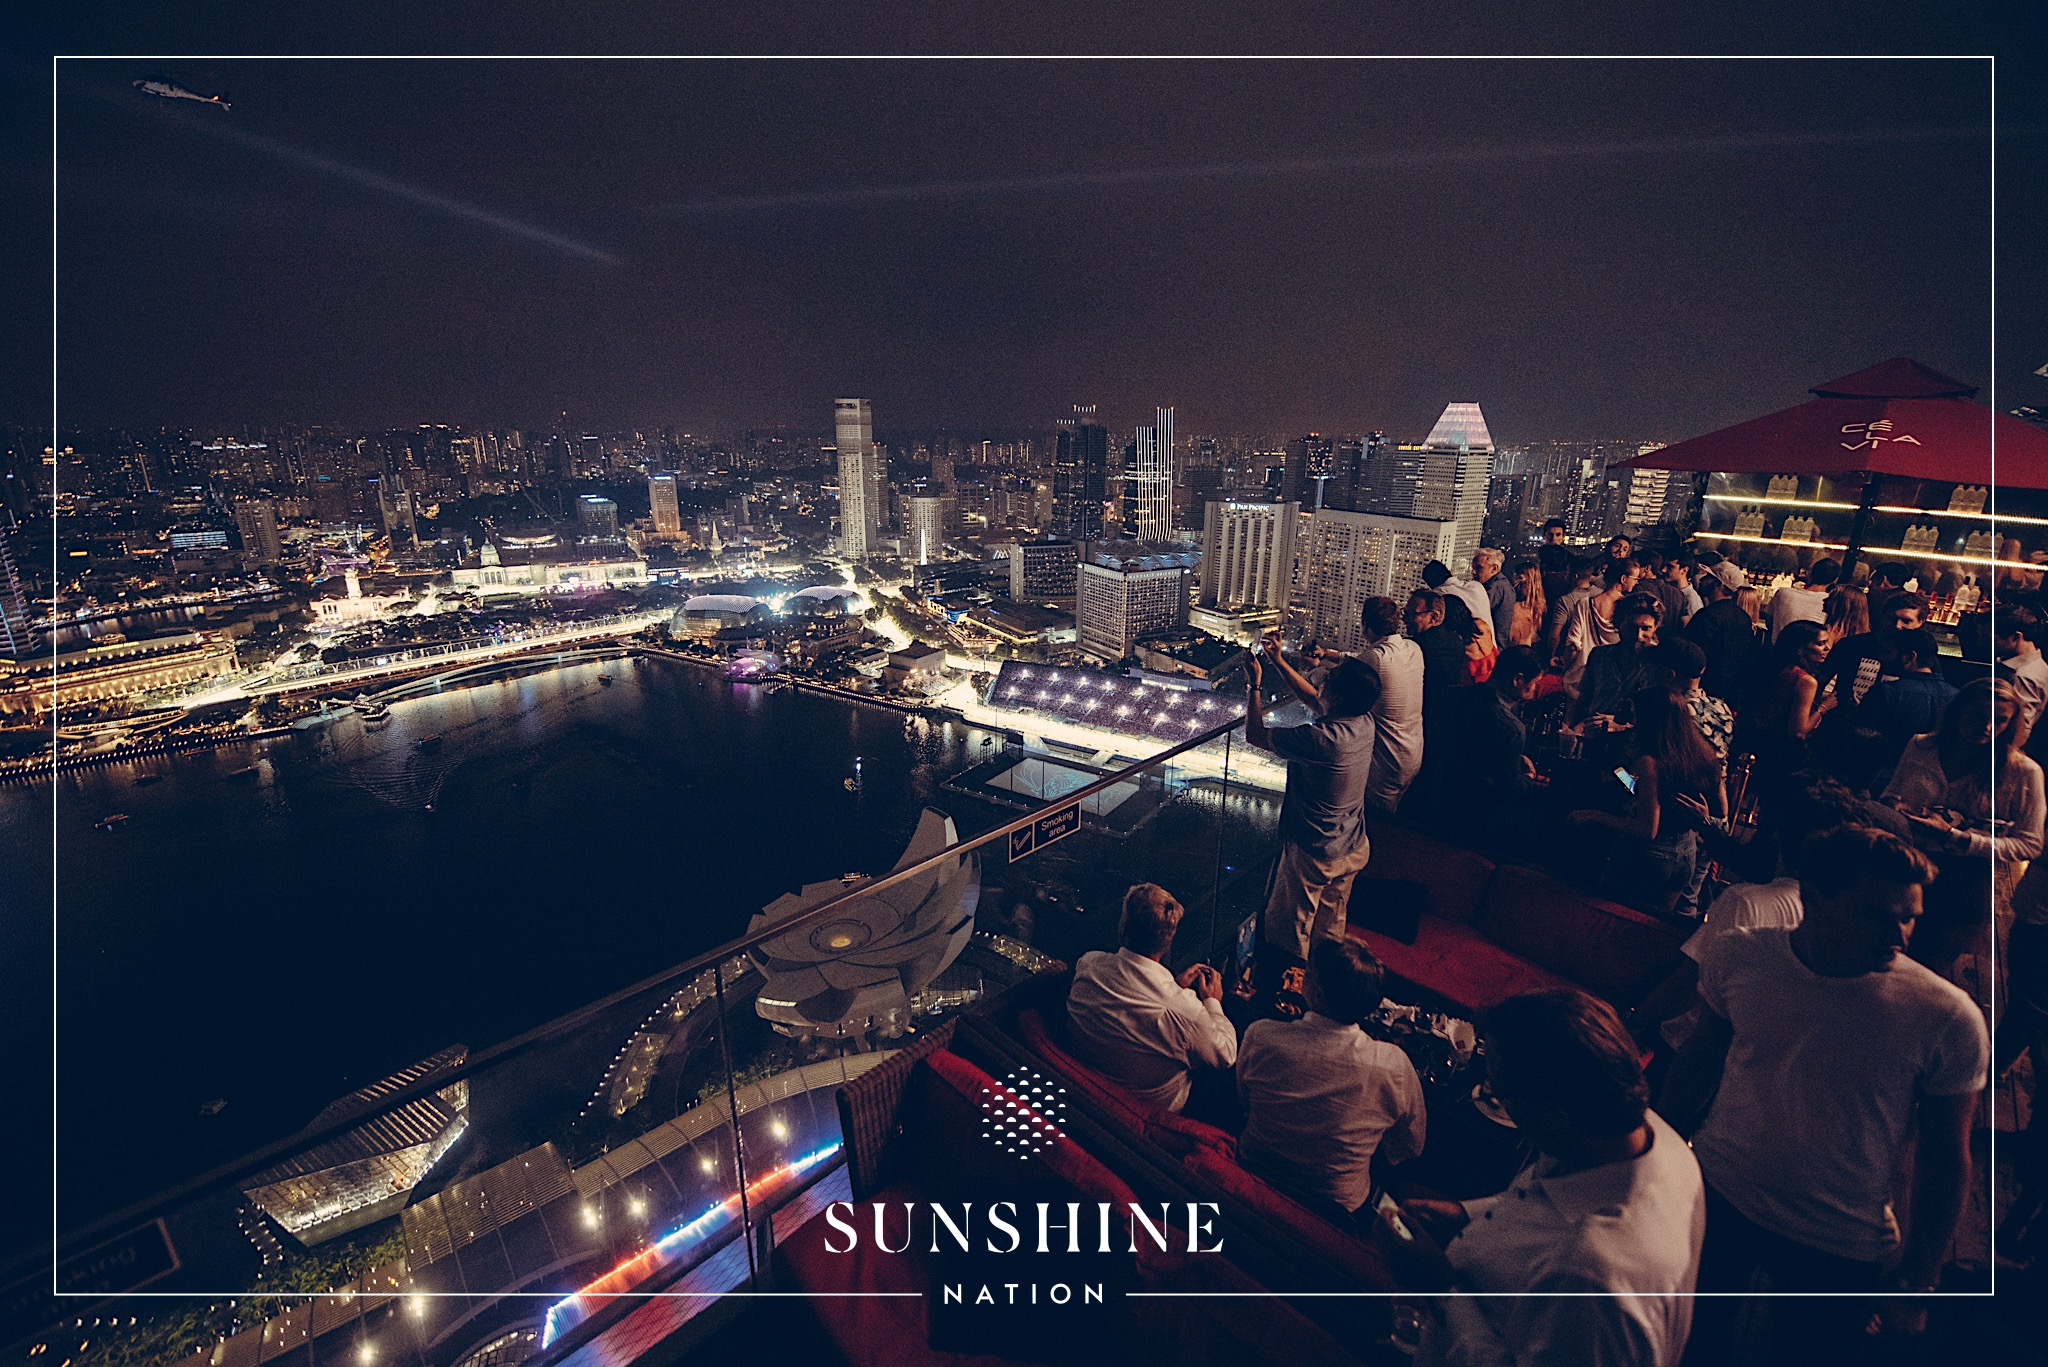 16092018_SunshineNation_Colossal101_Watermarked.jpg